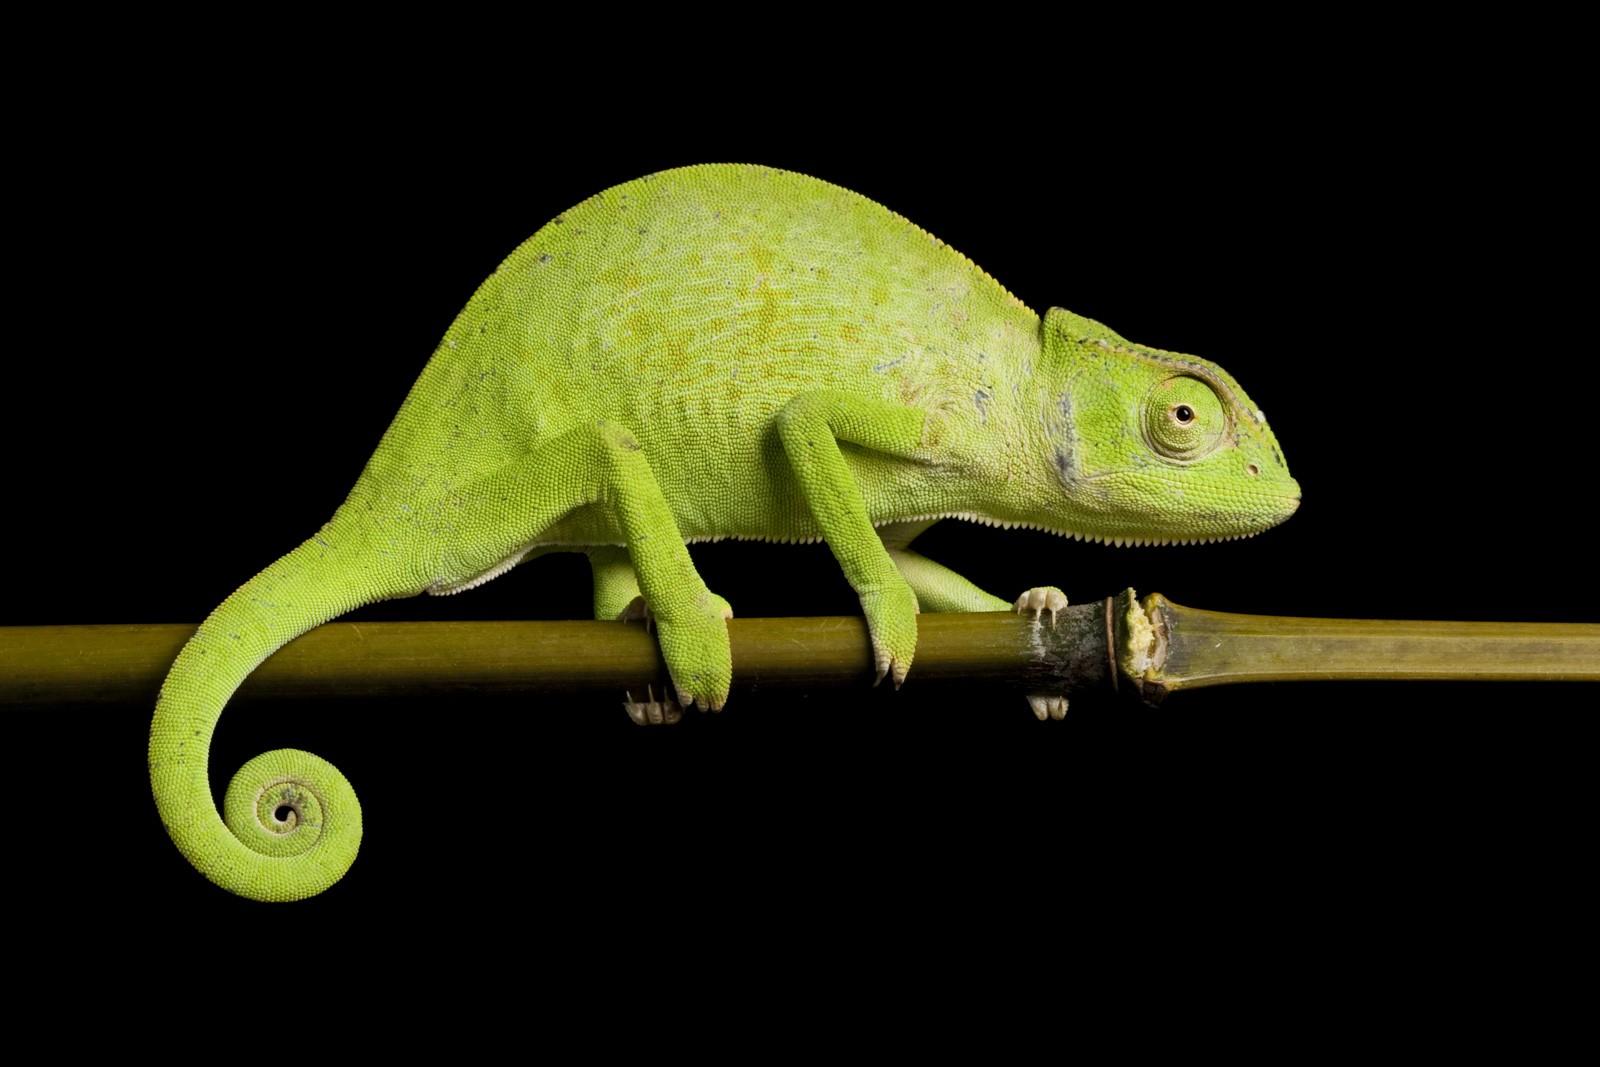 Symbolic Chameleon Meanings